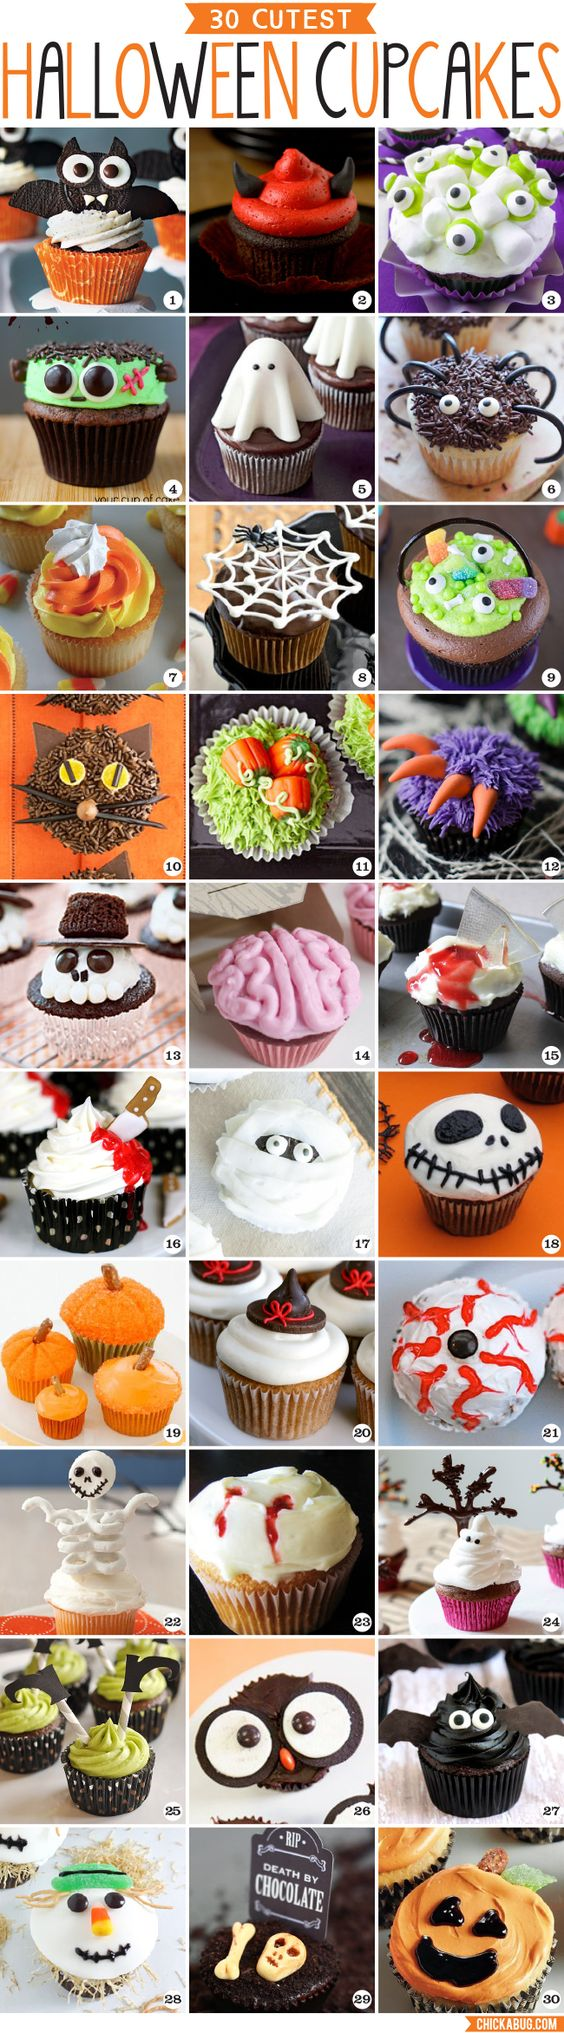 Carrellata di cupcakes tema Halloween #halloweencupcakes: